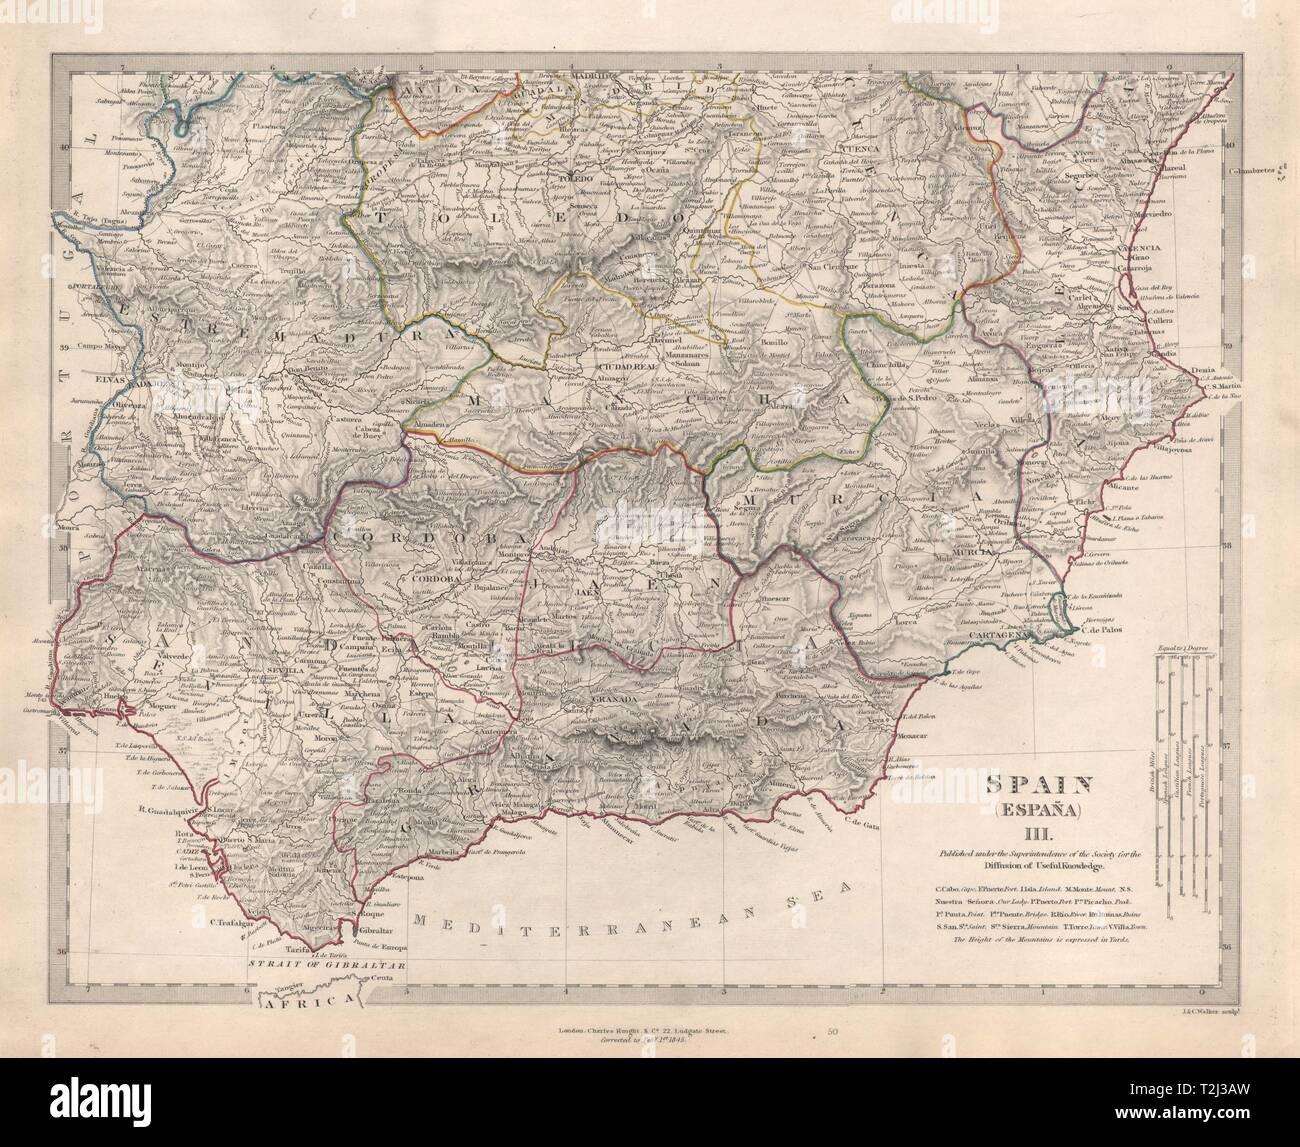 Map Of Spain Jaen.Spain South Sevilla Granada Cordoba Murcia Jaen Valencia Toledo